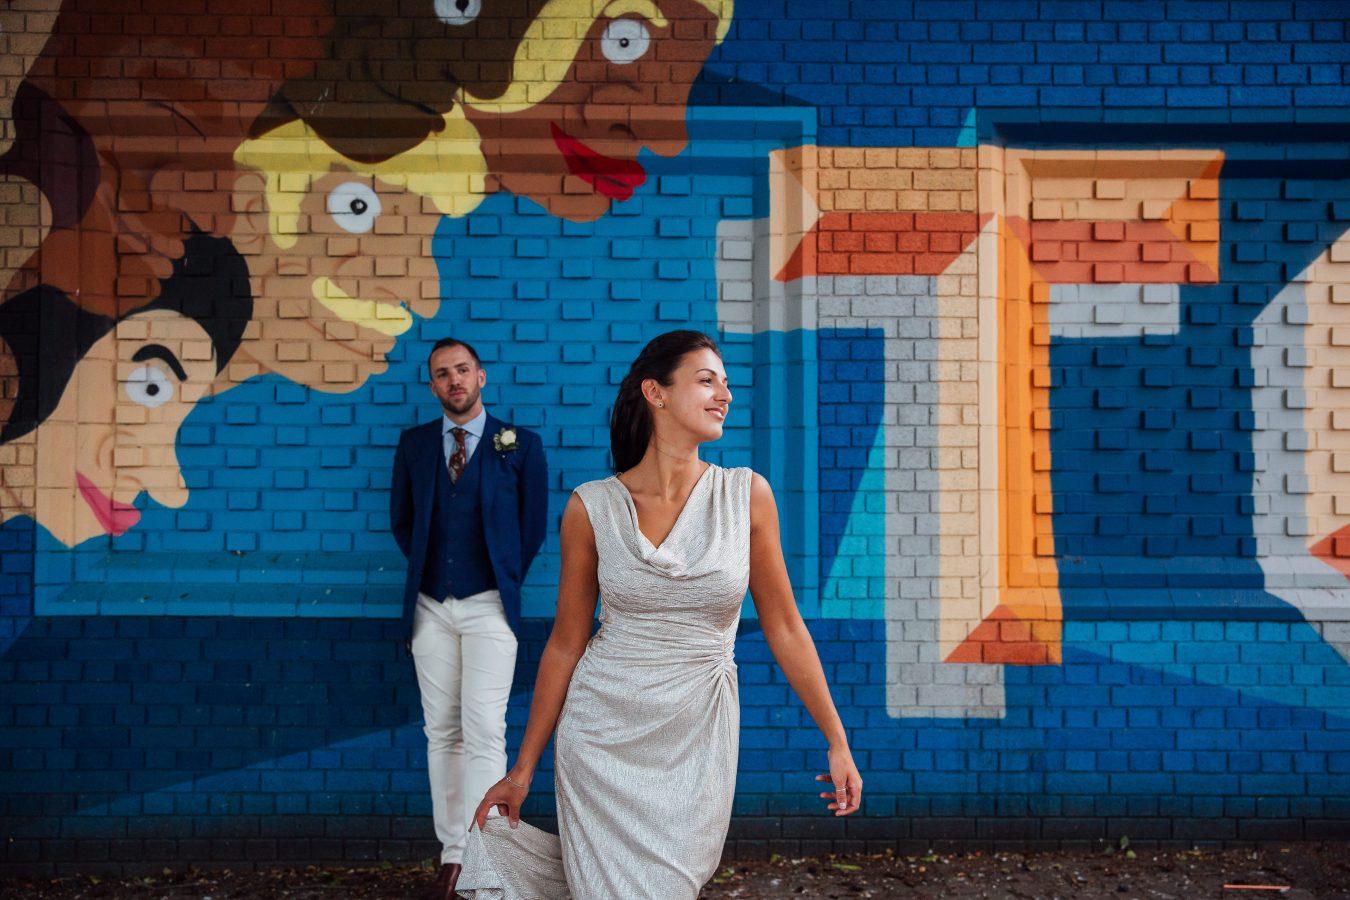 Laura-George-Jules-Barron-Leeds-Inner-City-Wedding-2018-880